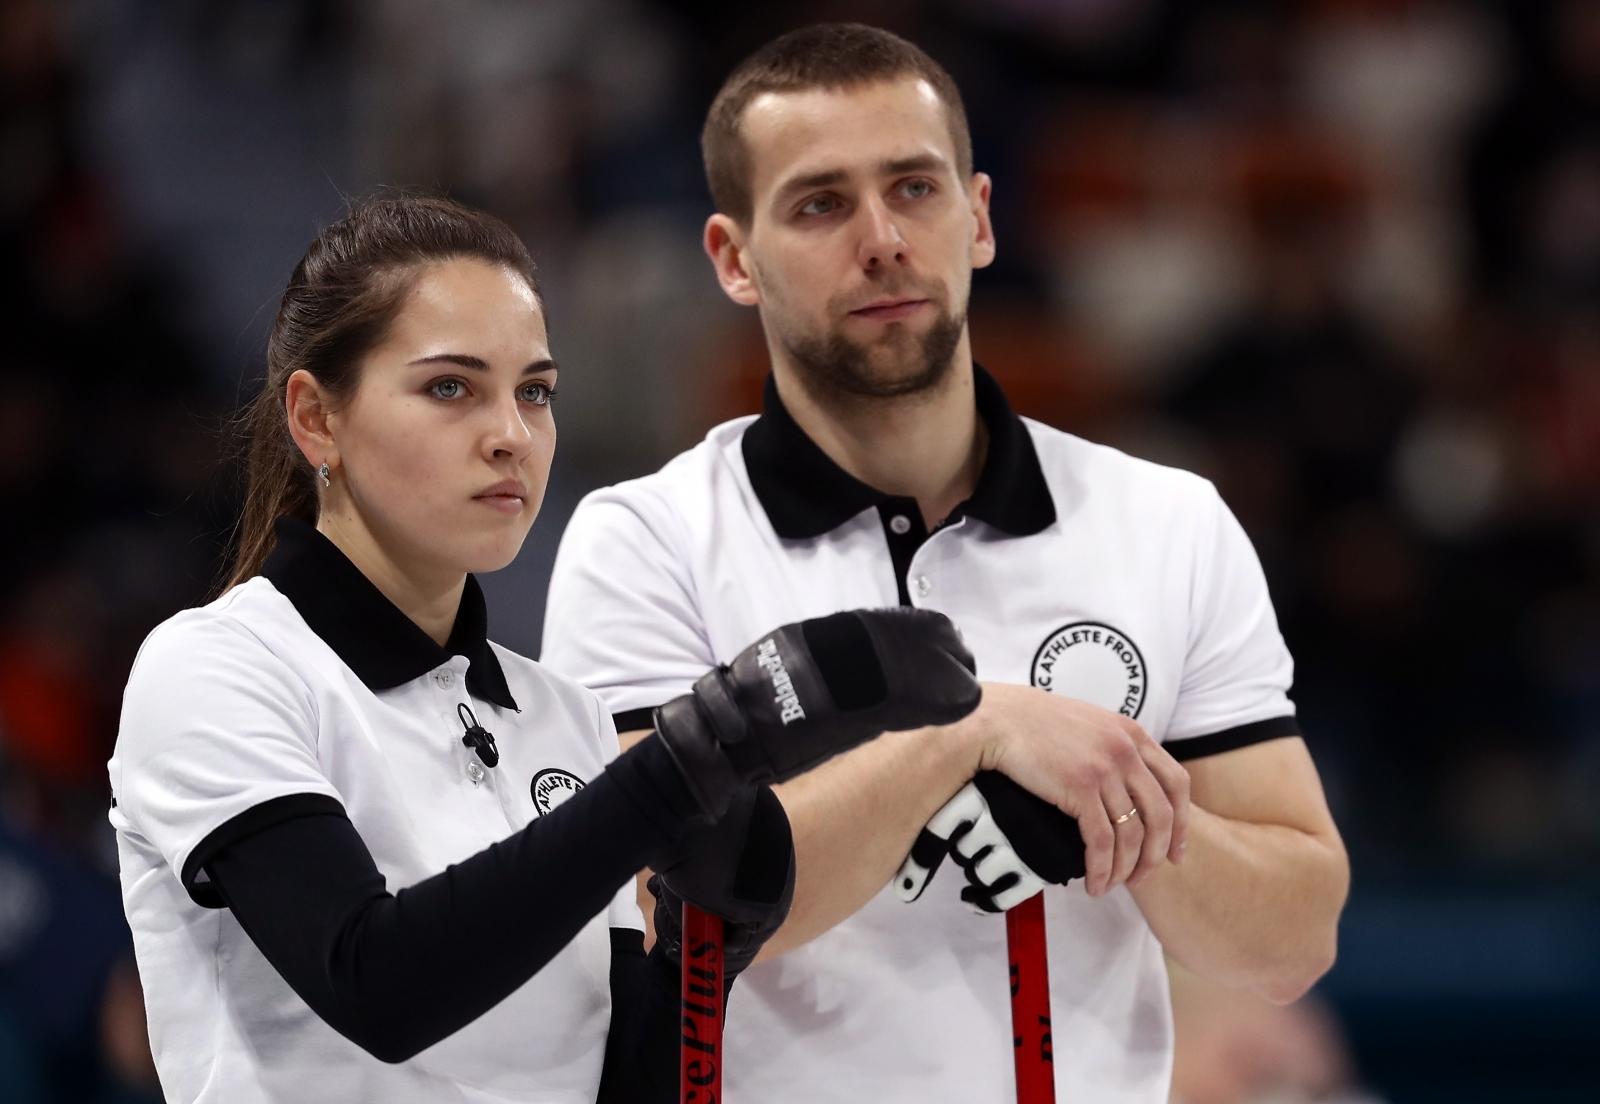 Aleksandr Krushelnitckii and Anastasia Bryzgalova